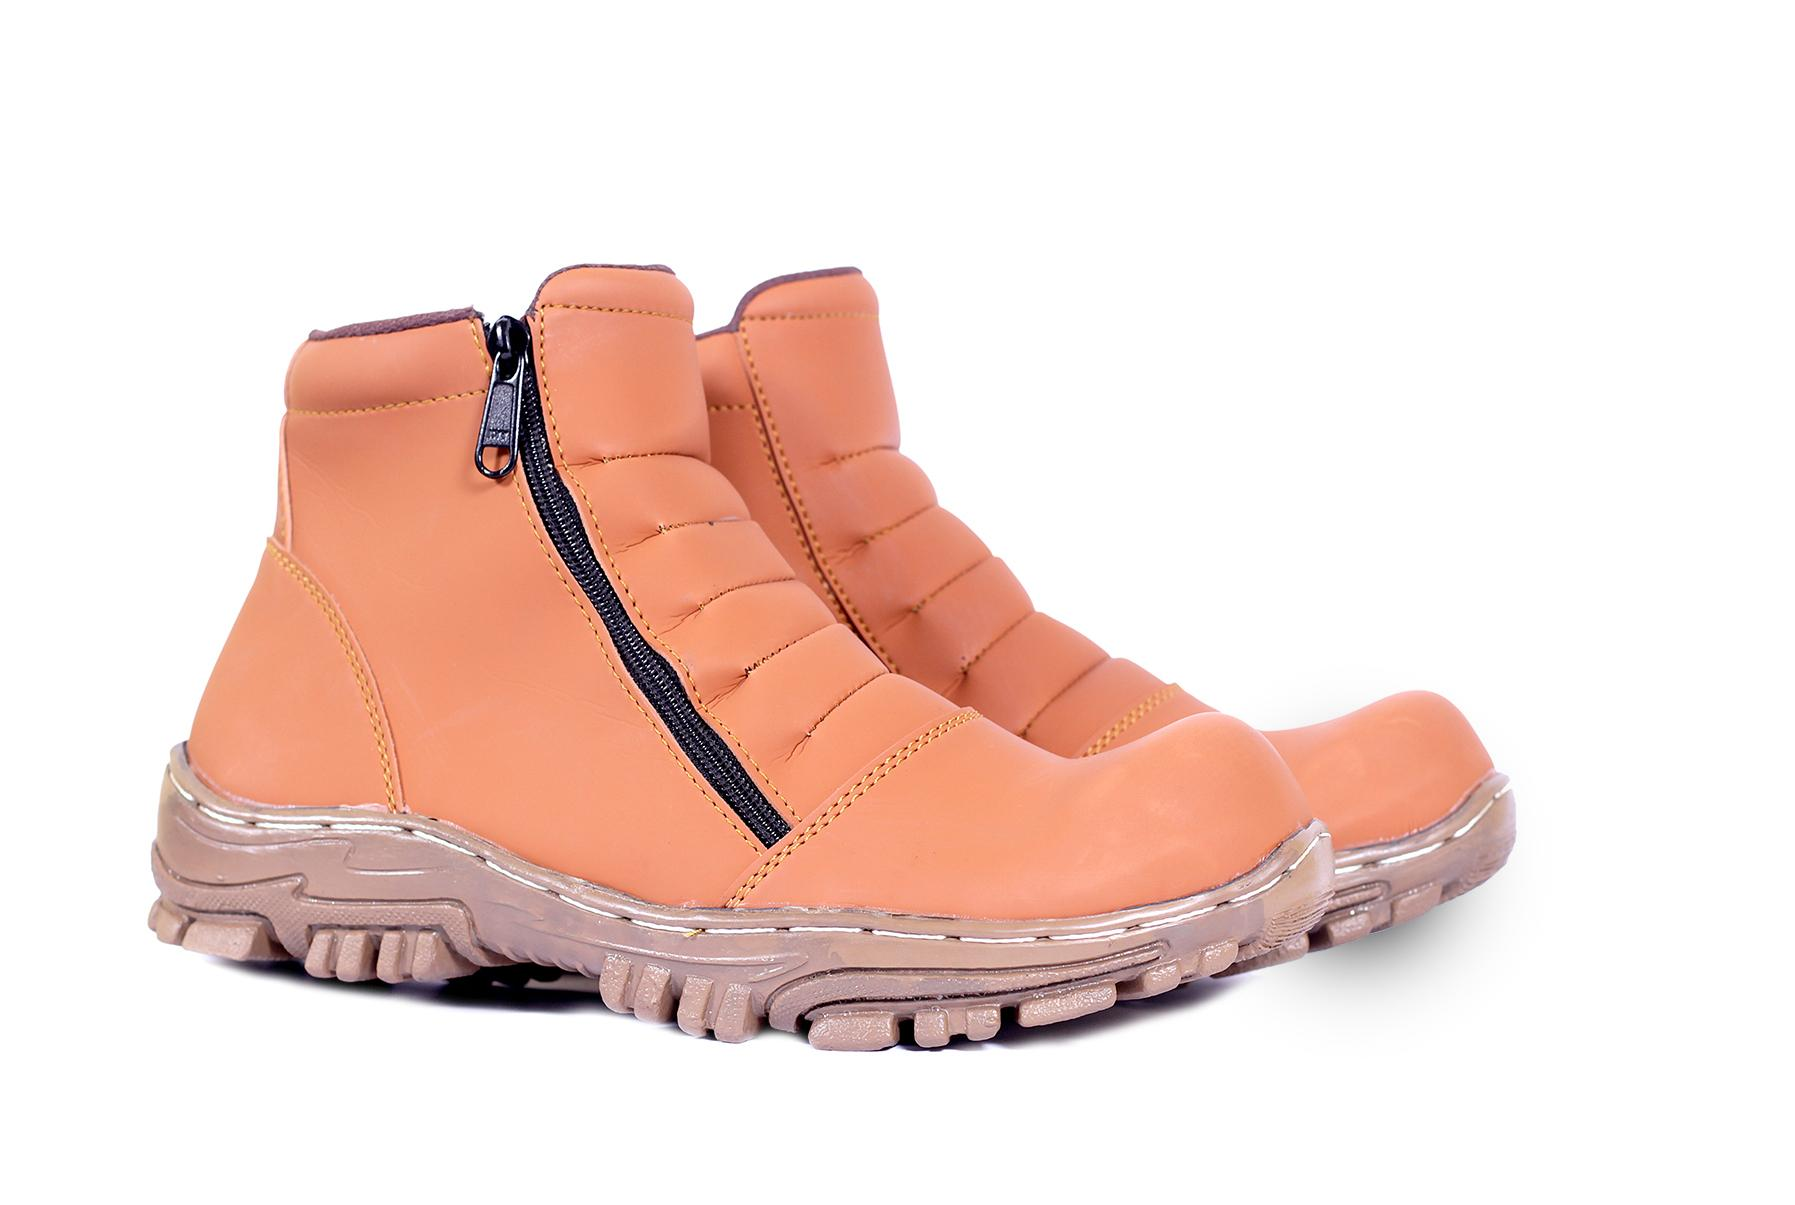 Sepatu Pria Elastico Men Boots Work & Safety Boots Sepatu Pria Klasik Boots Murah